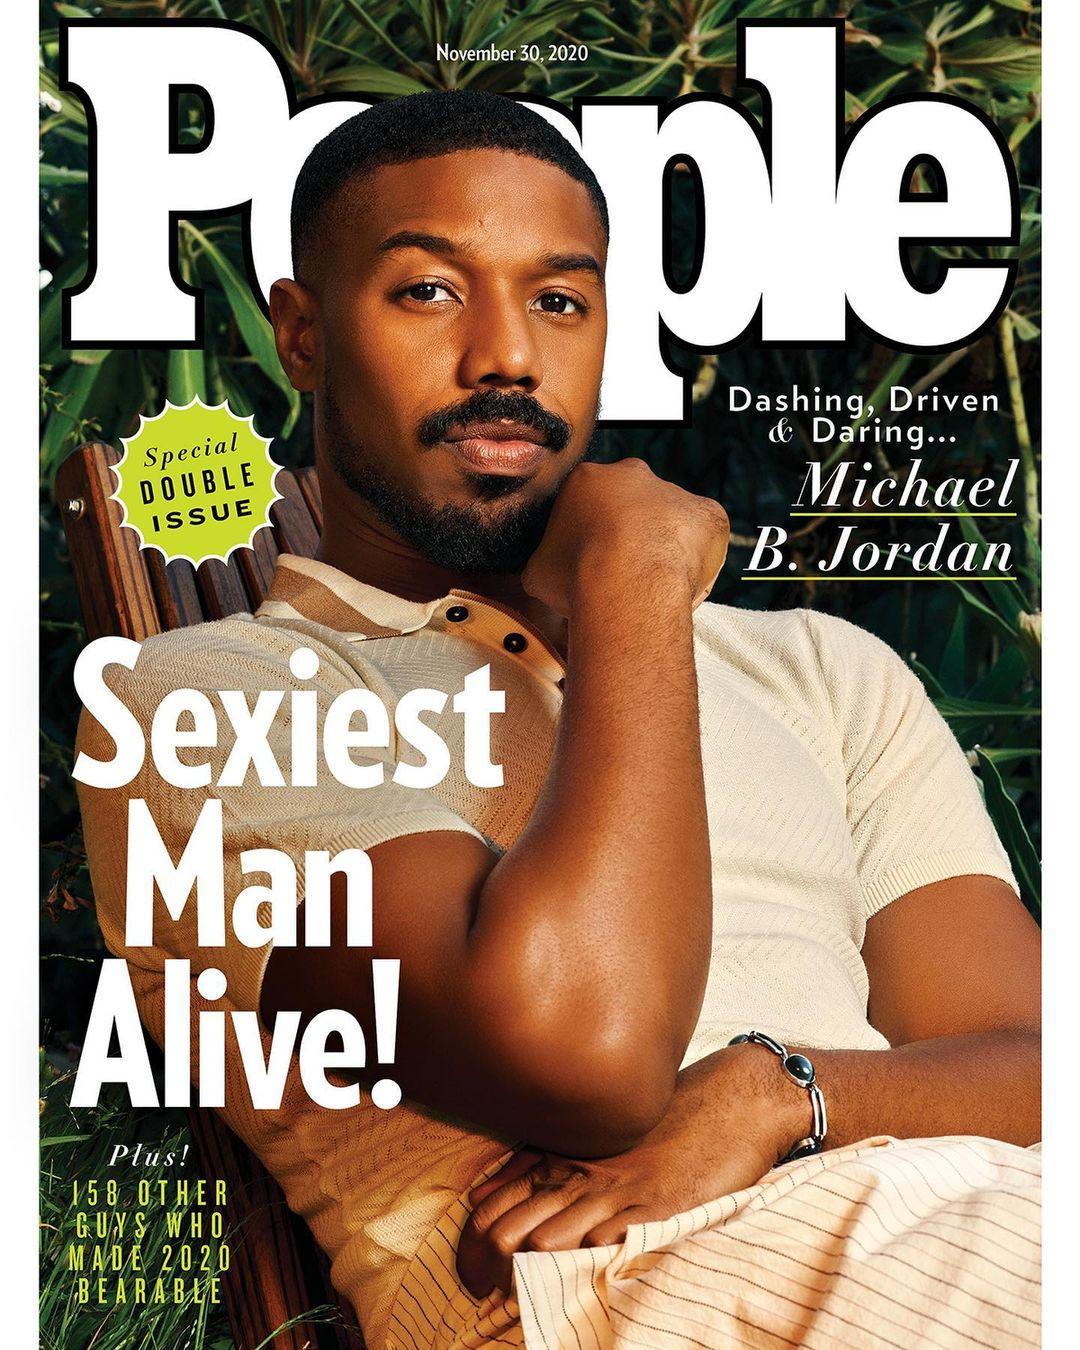 People's 2020 Sexiest Man Alive Is... Michael B. Jordan | BellaNaija